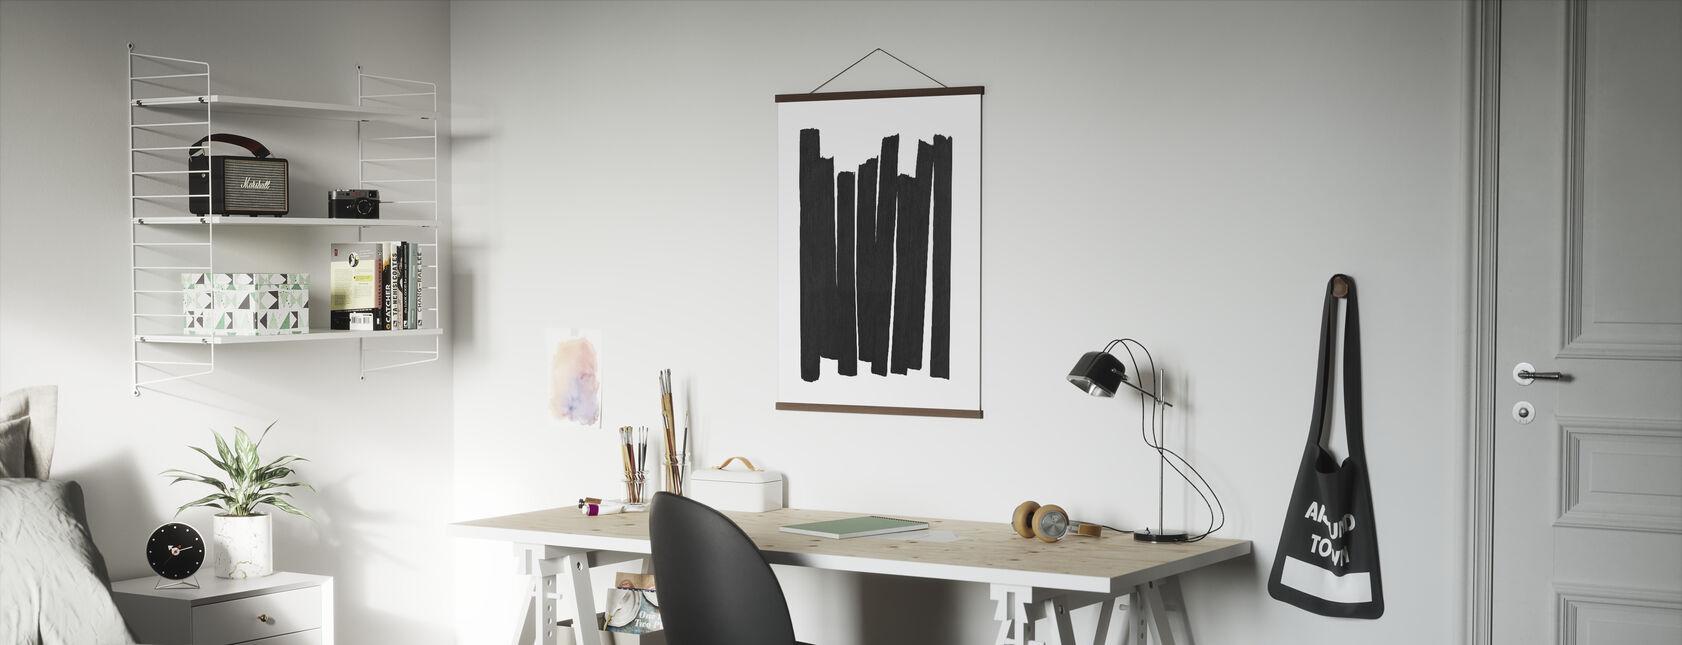 Svarta penseldrag II - Poster - Kontor